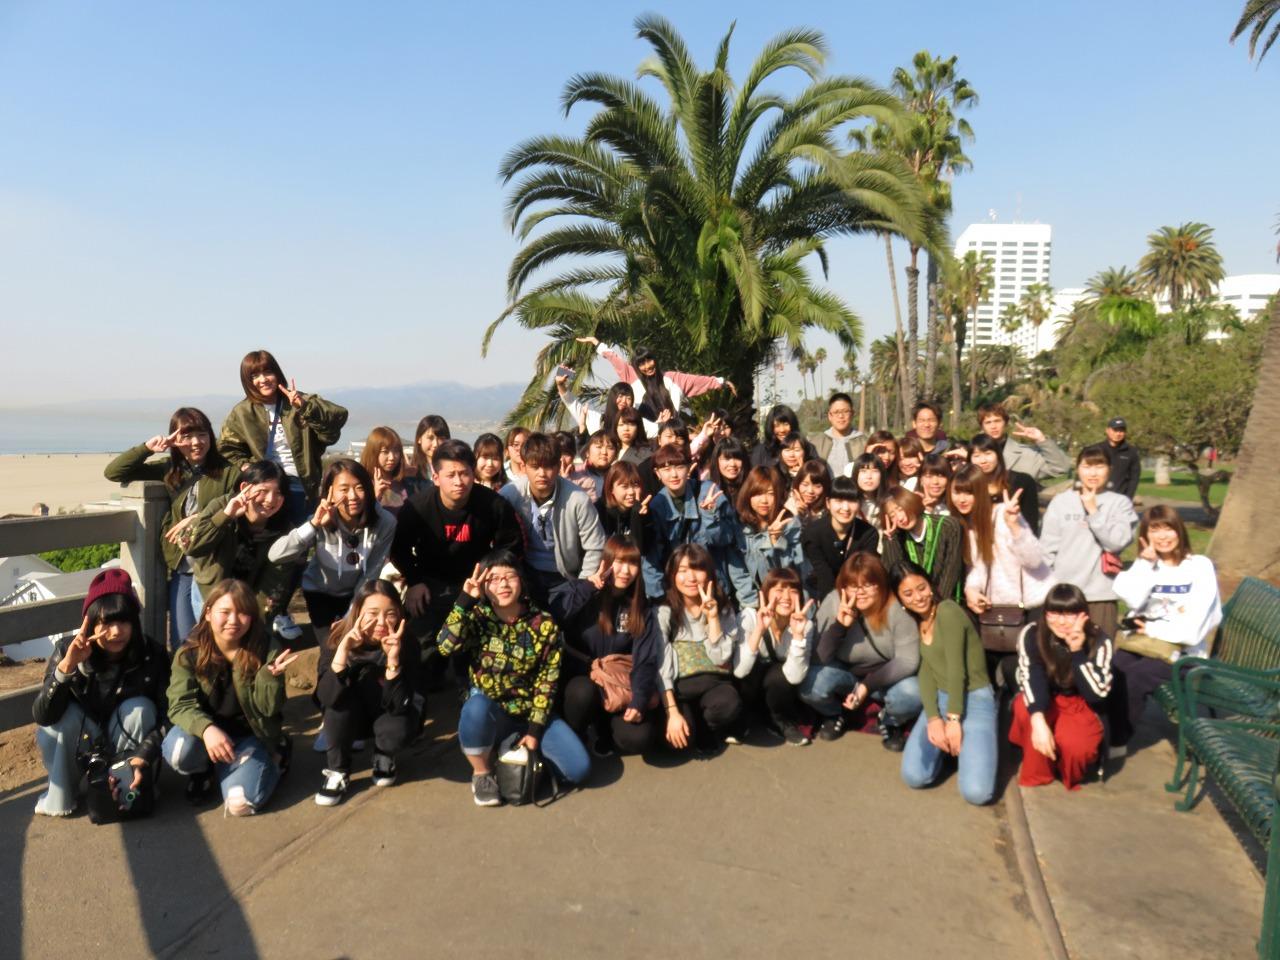 http://tokyo.iac.ac.jp/blog/photos/2018020126sanntamonika.jpg